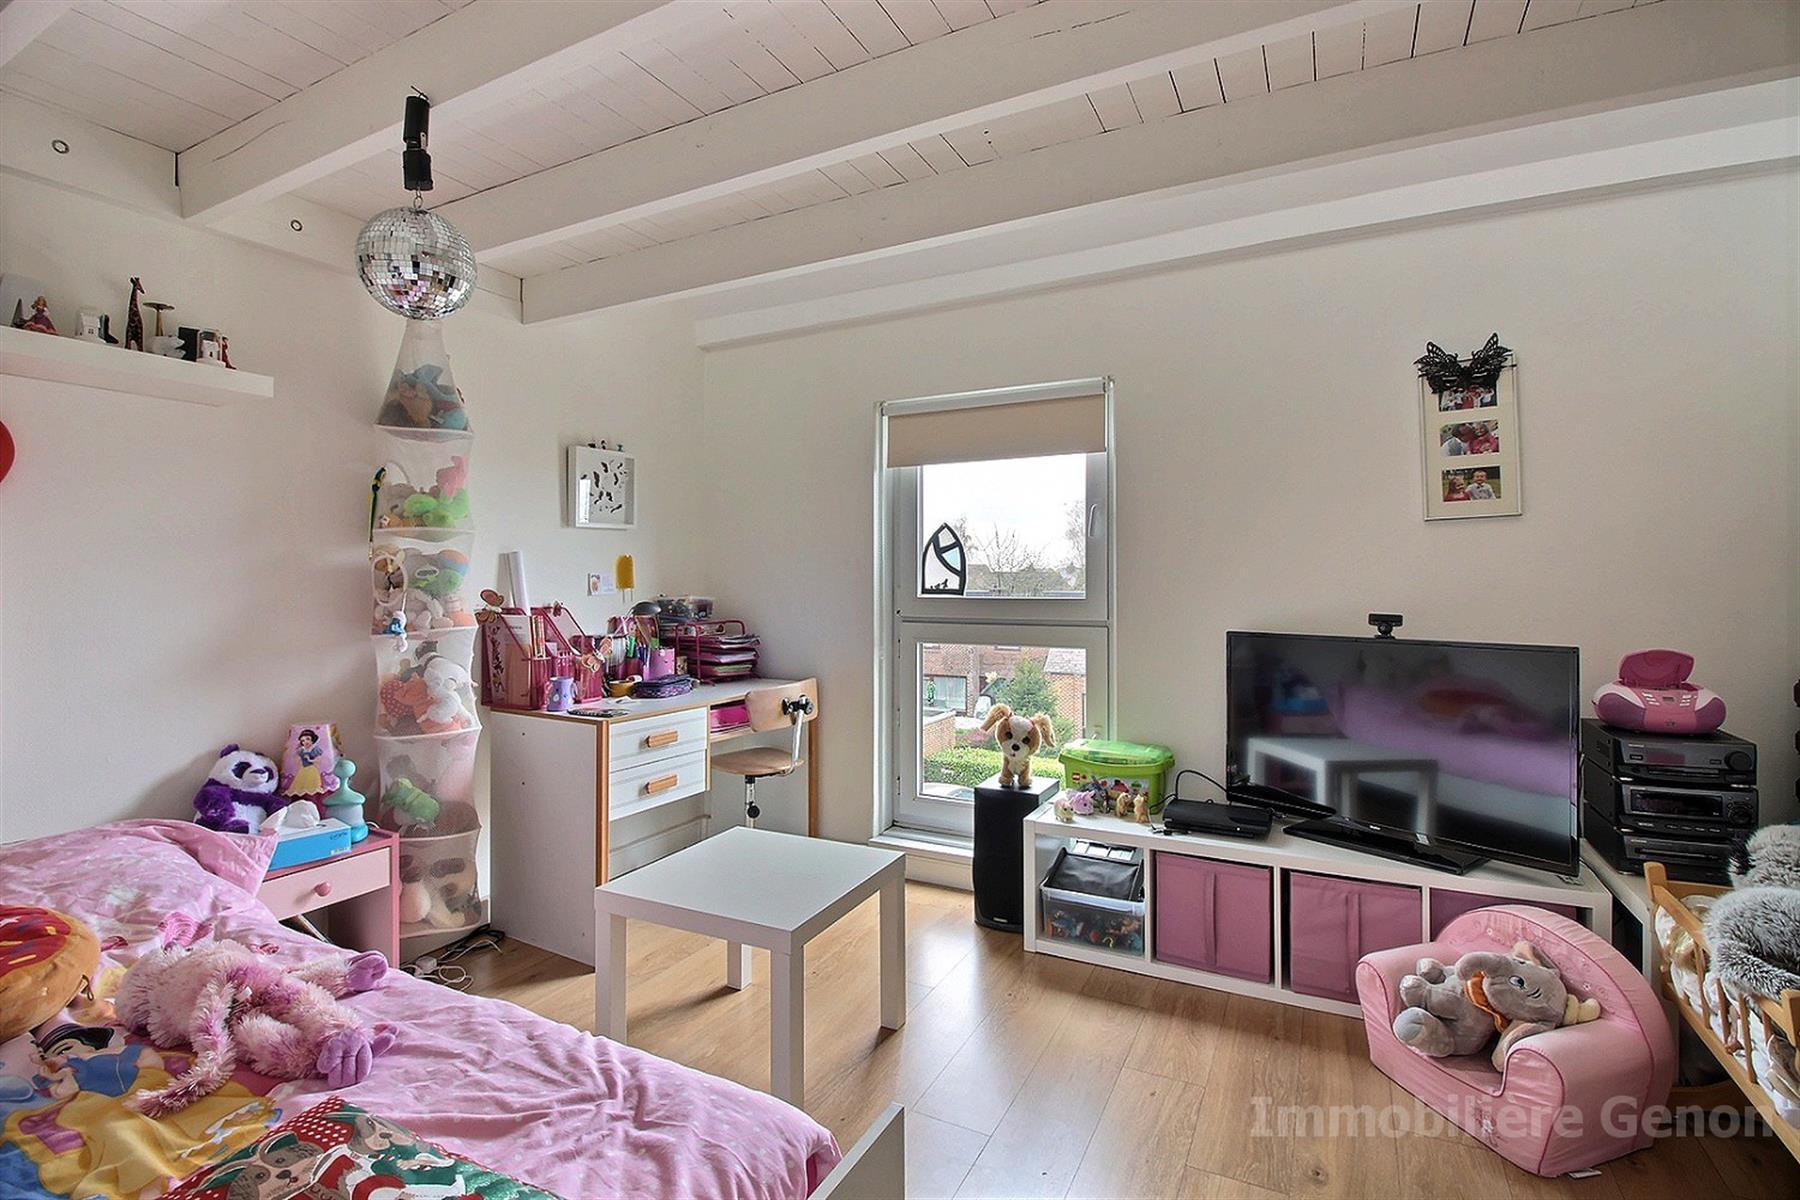 Maison - Ottignies-Louvain-la-Neuve - #4532084-9